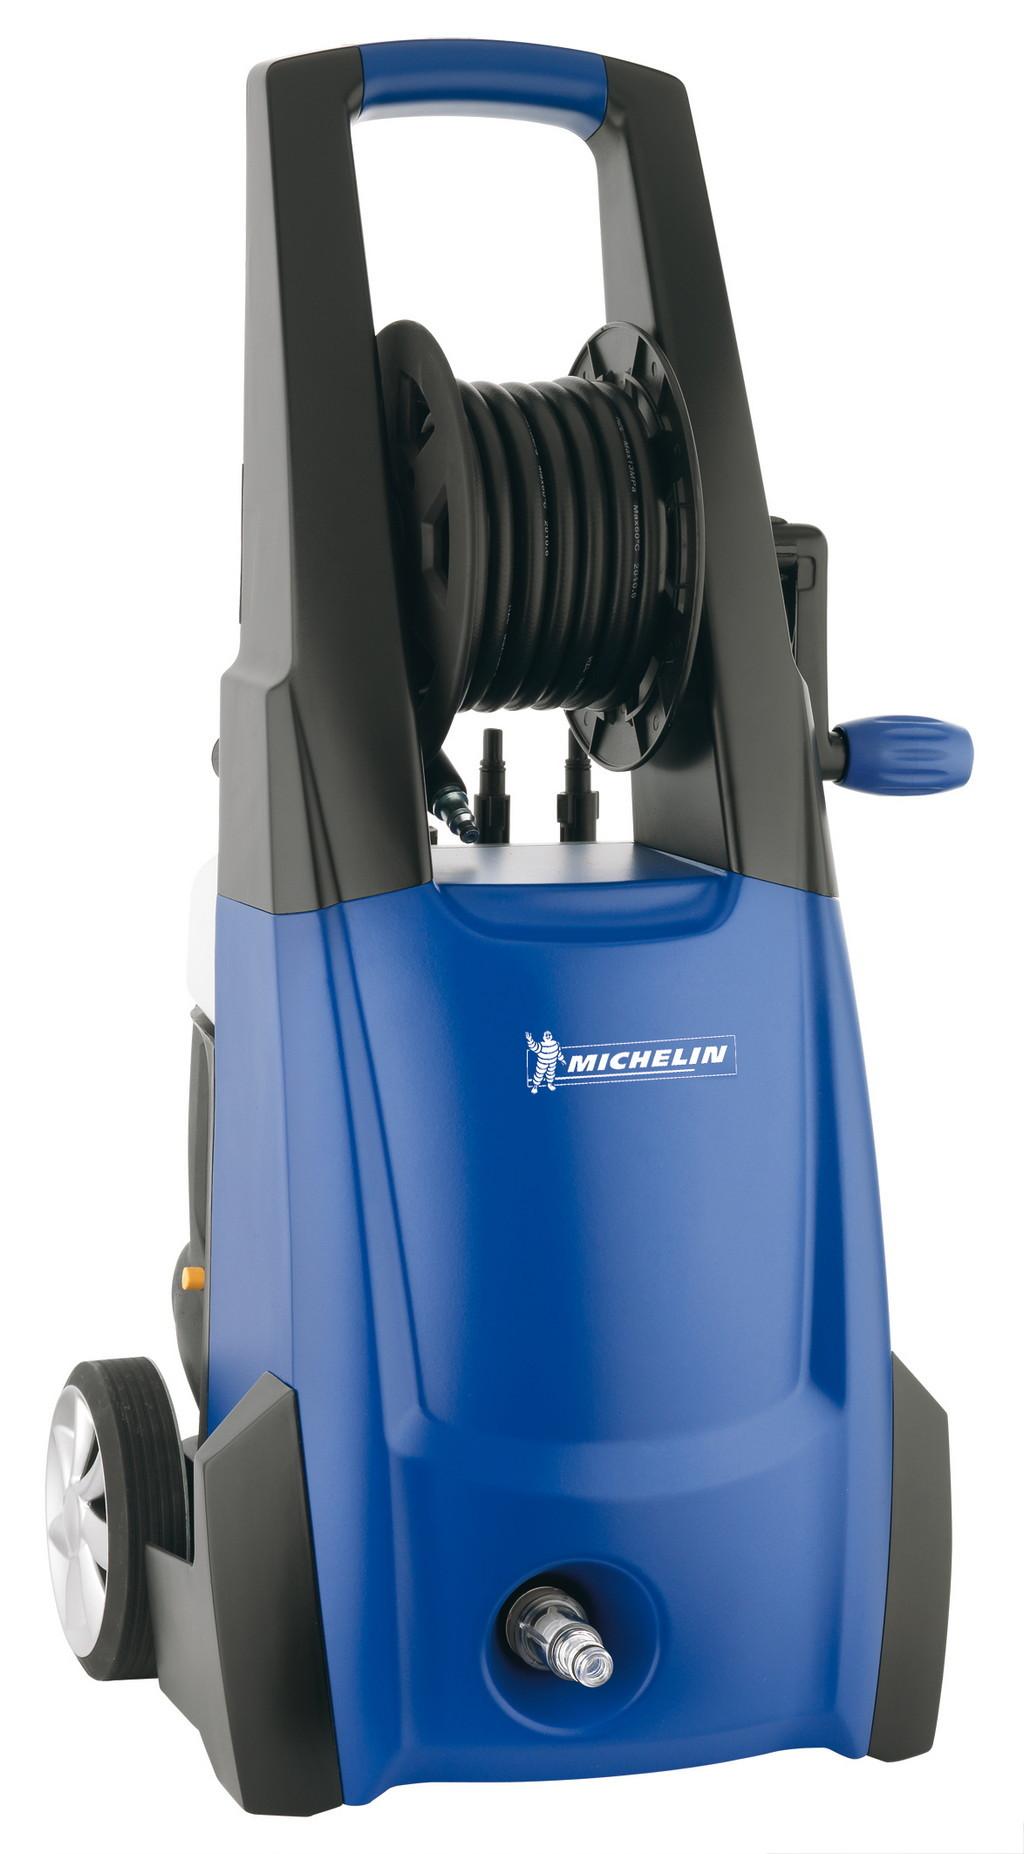 elektrický vysokotlakový čistič Michelin MPX 130 B